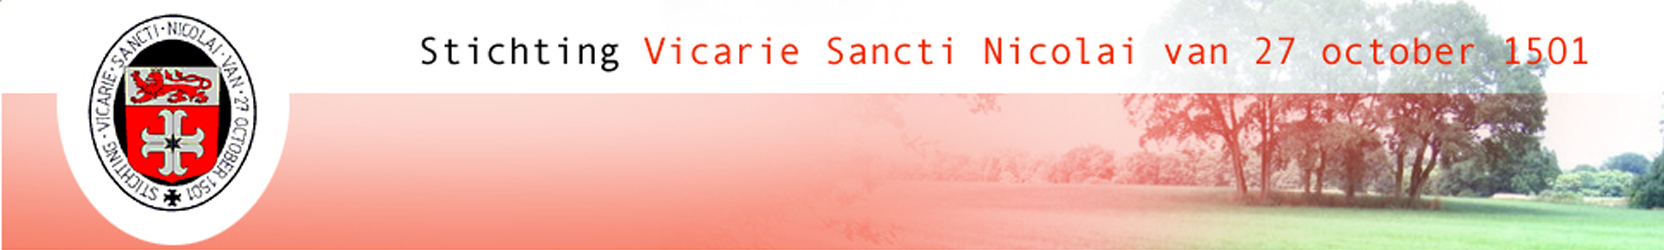 Stiftung Vicarie Sancti Nicolai